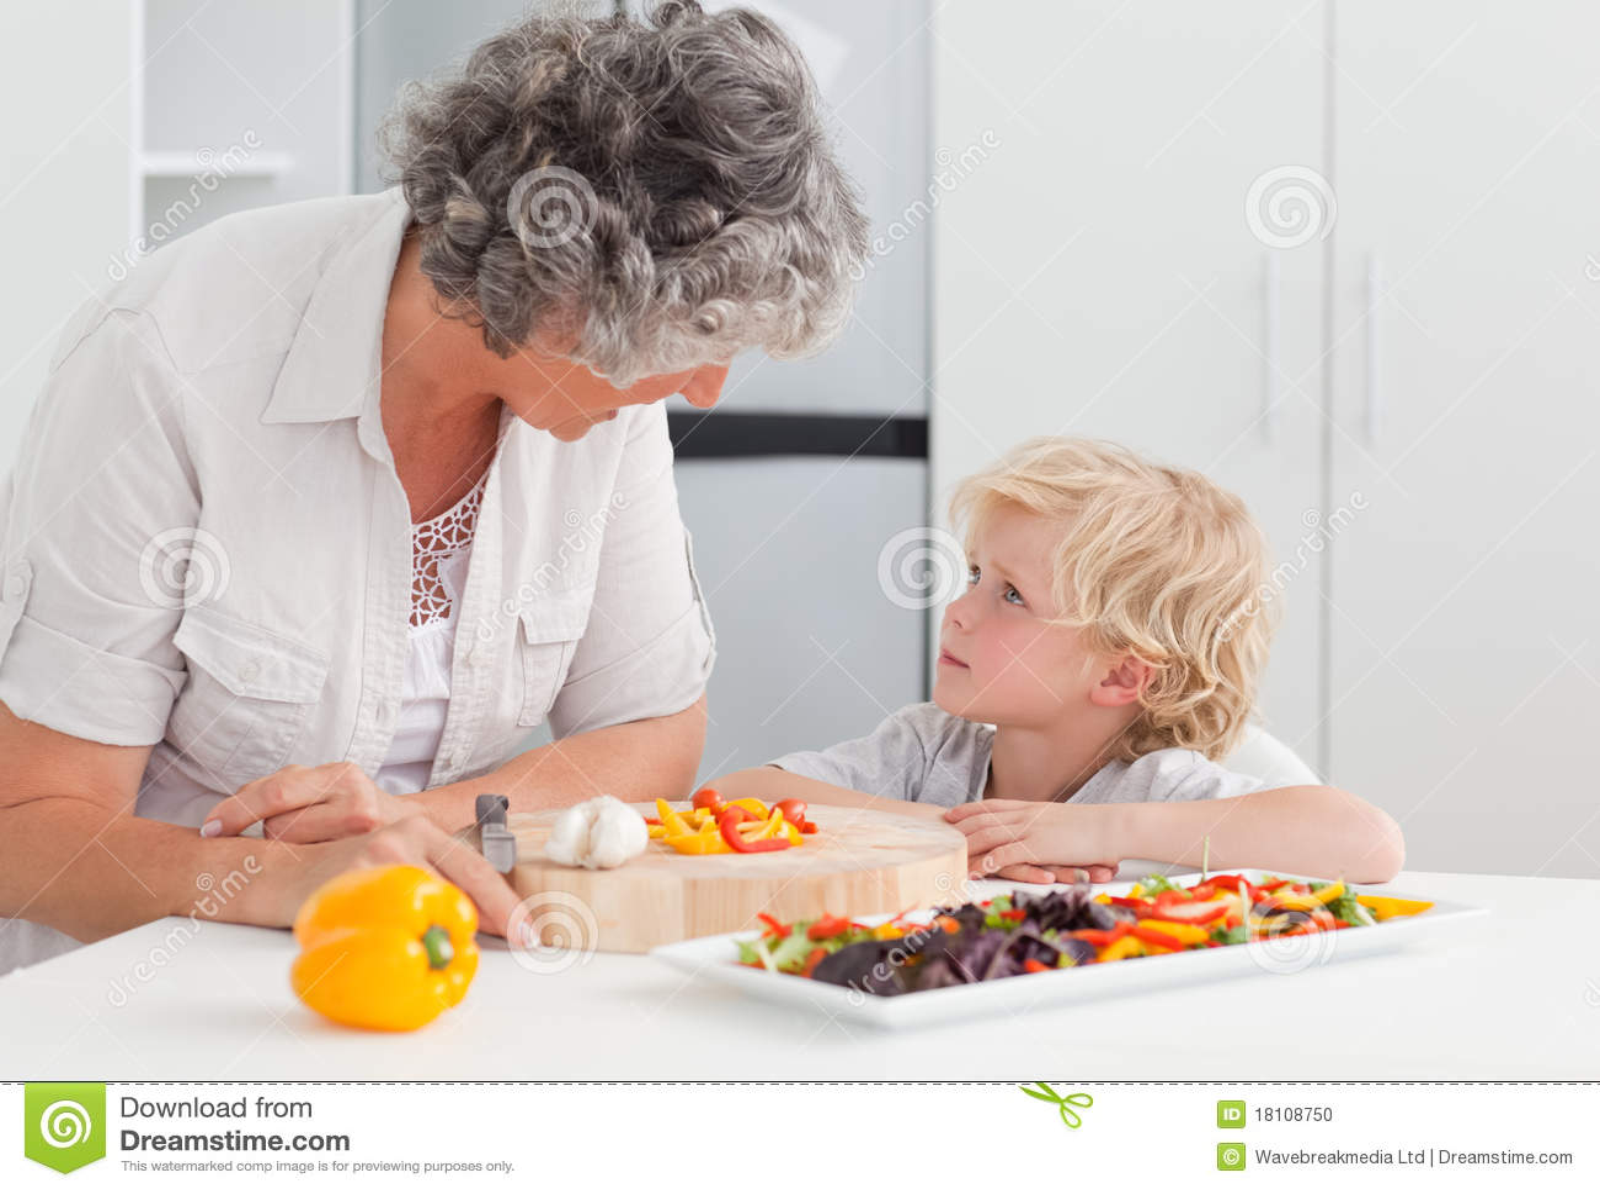 С бабушкой на кухне 13 фотография